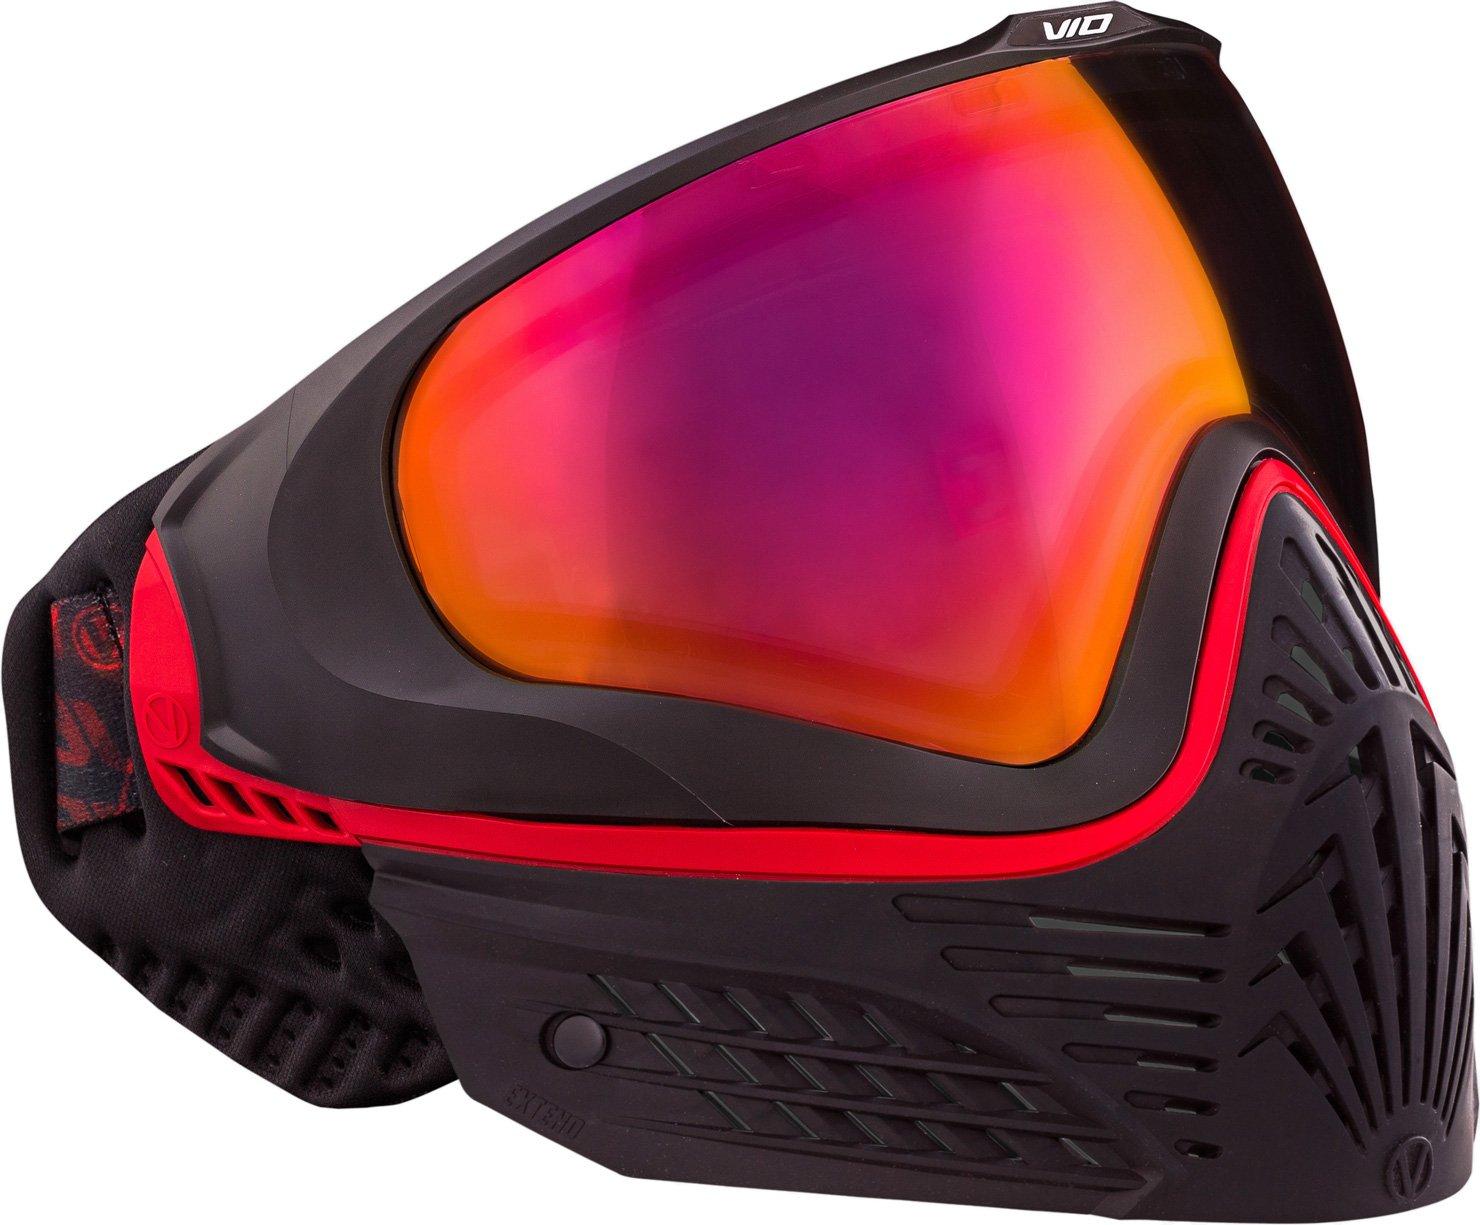 Virtue VIO Paintball Masks - Extend Black/Fire линейный массив db technologies vio s318